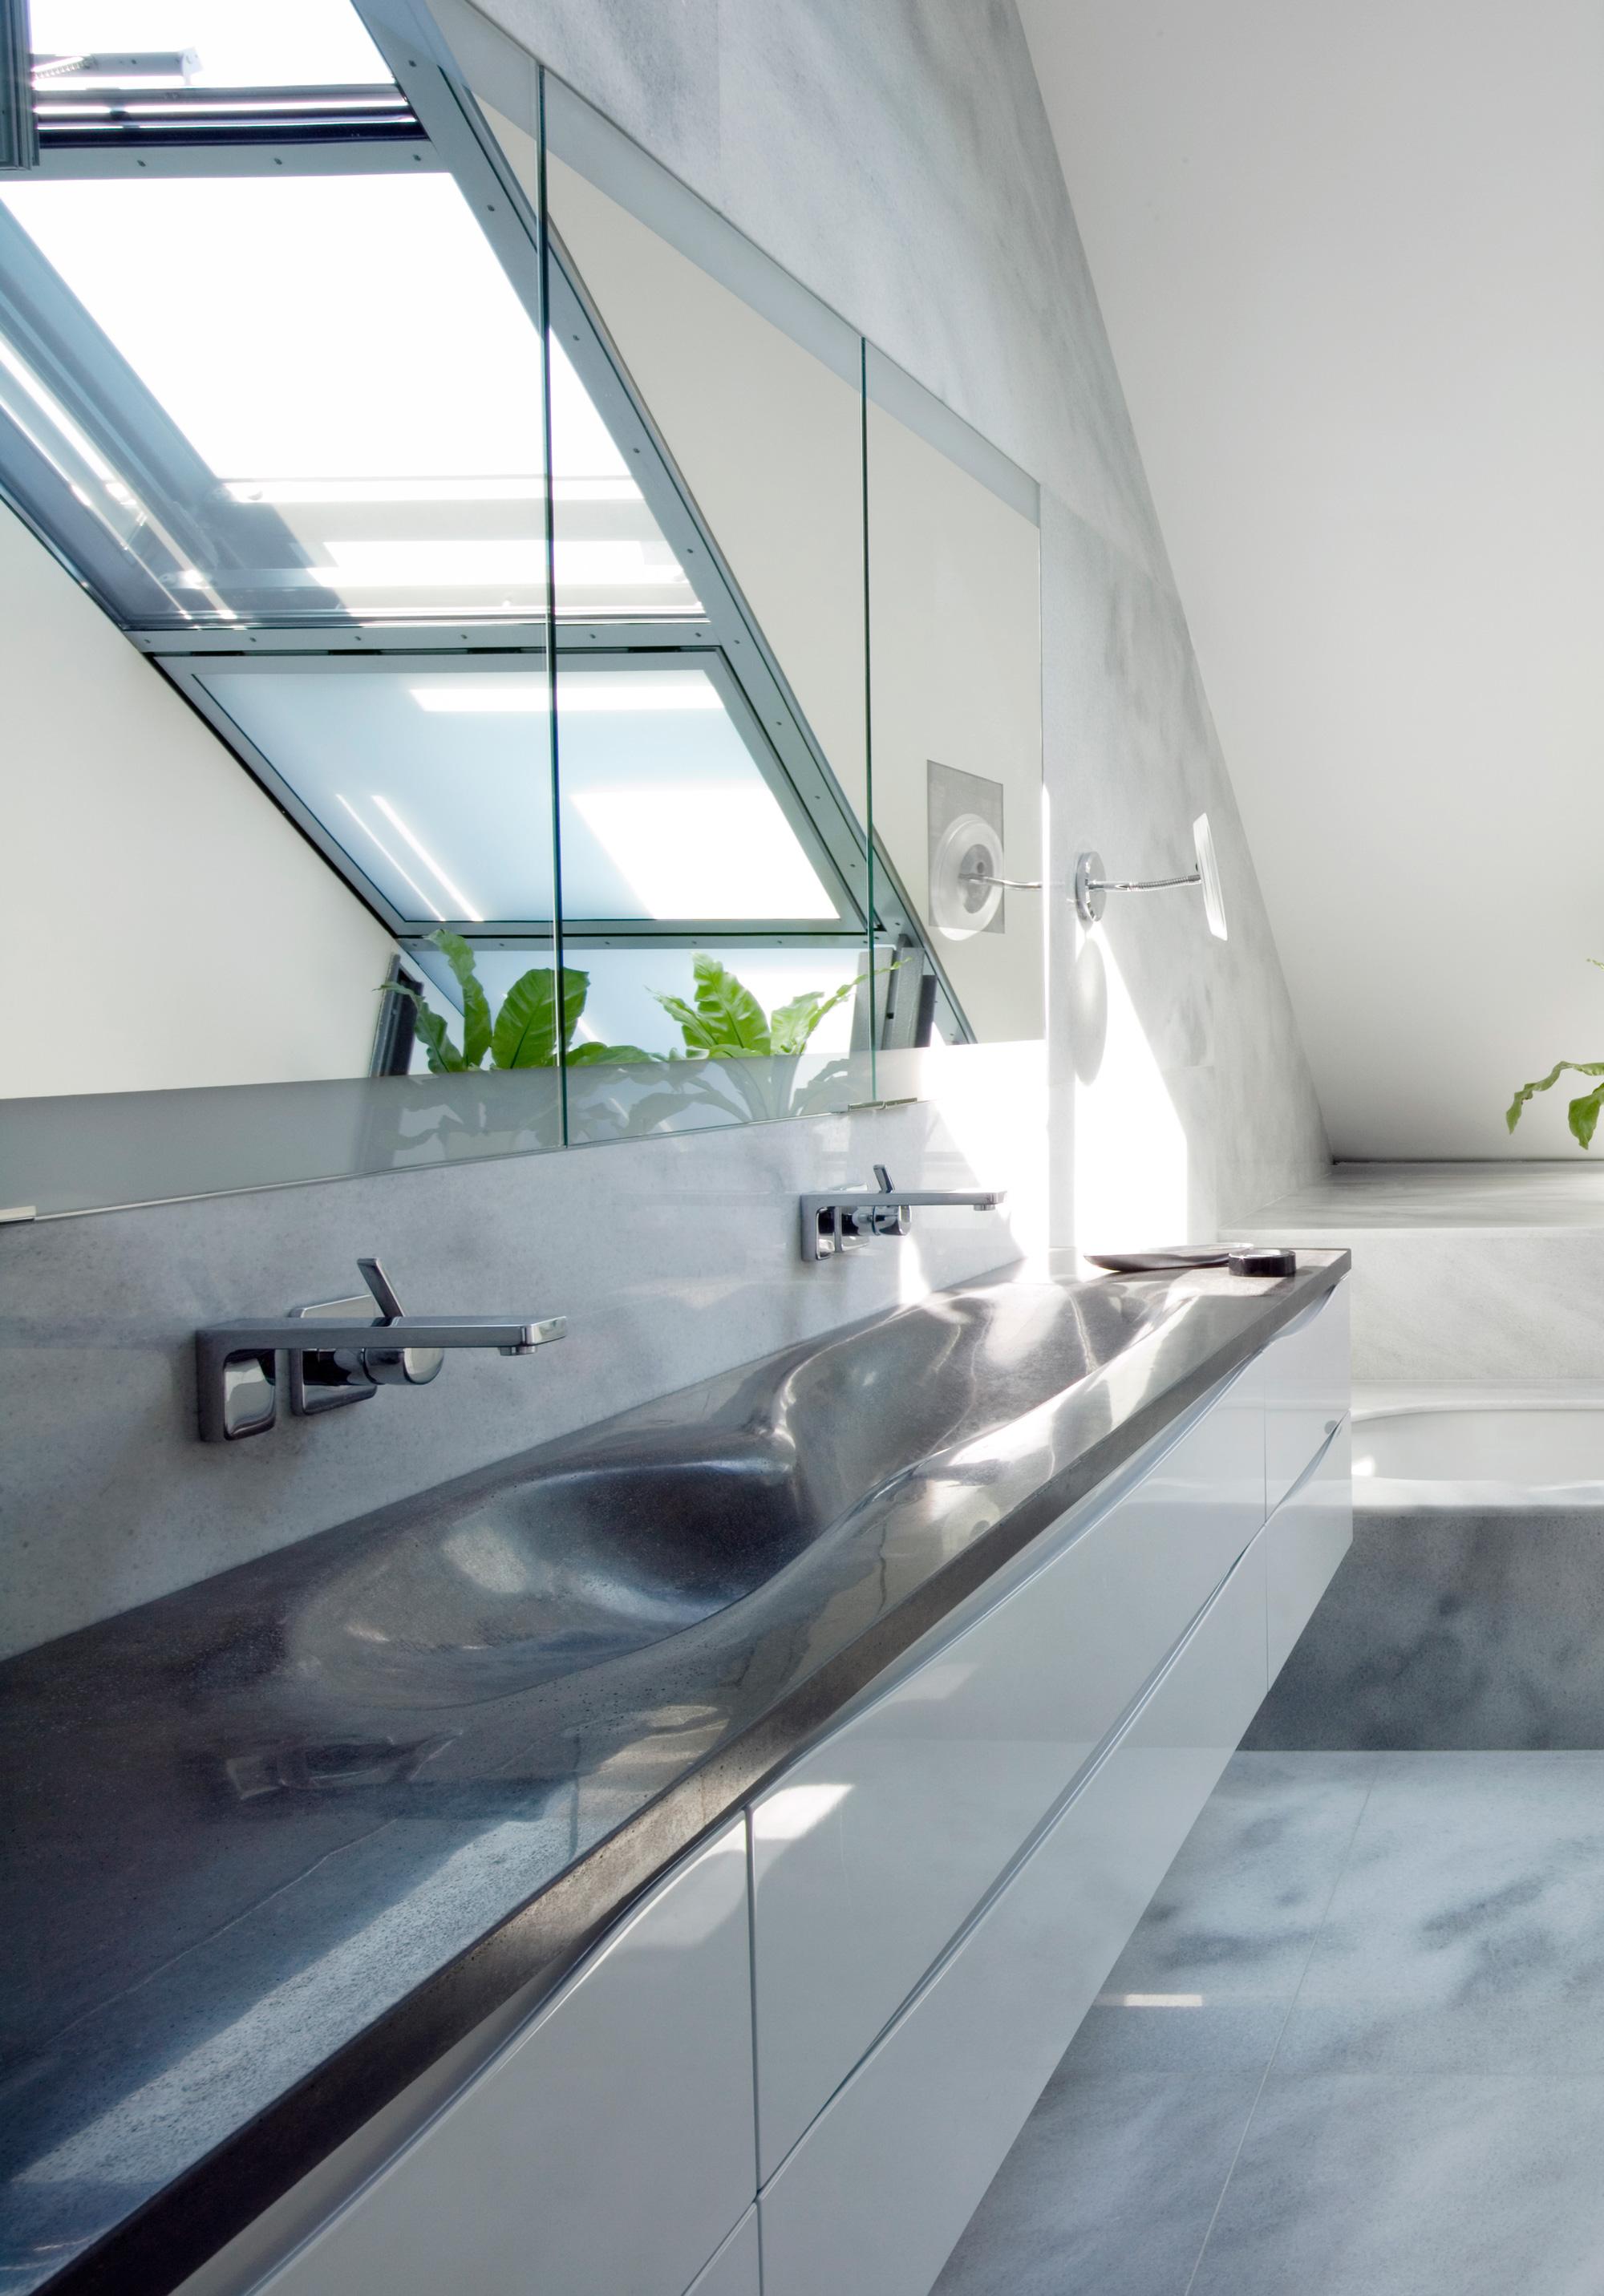 A01 architects - Cityloft_(c)Nadine Blanchard_web08.jpg